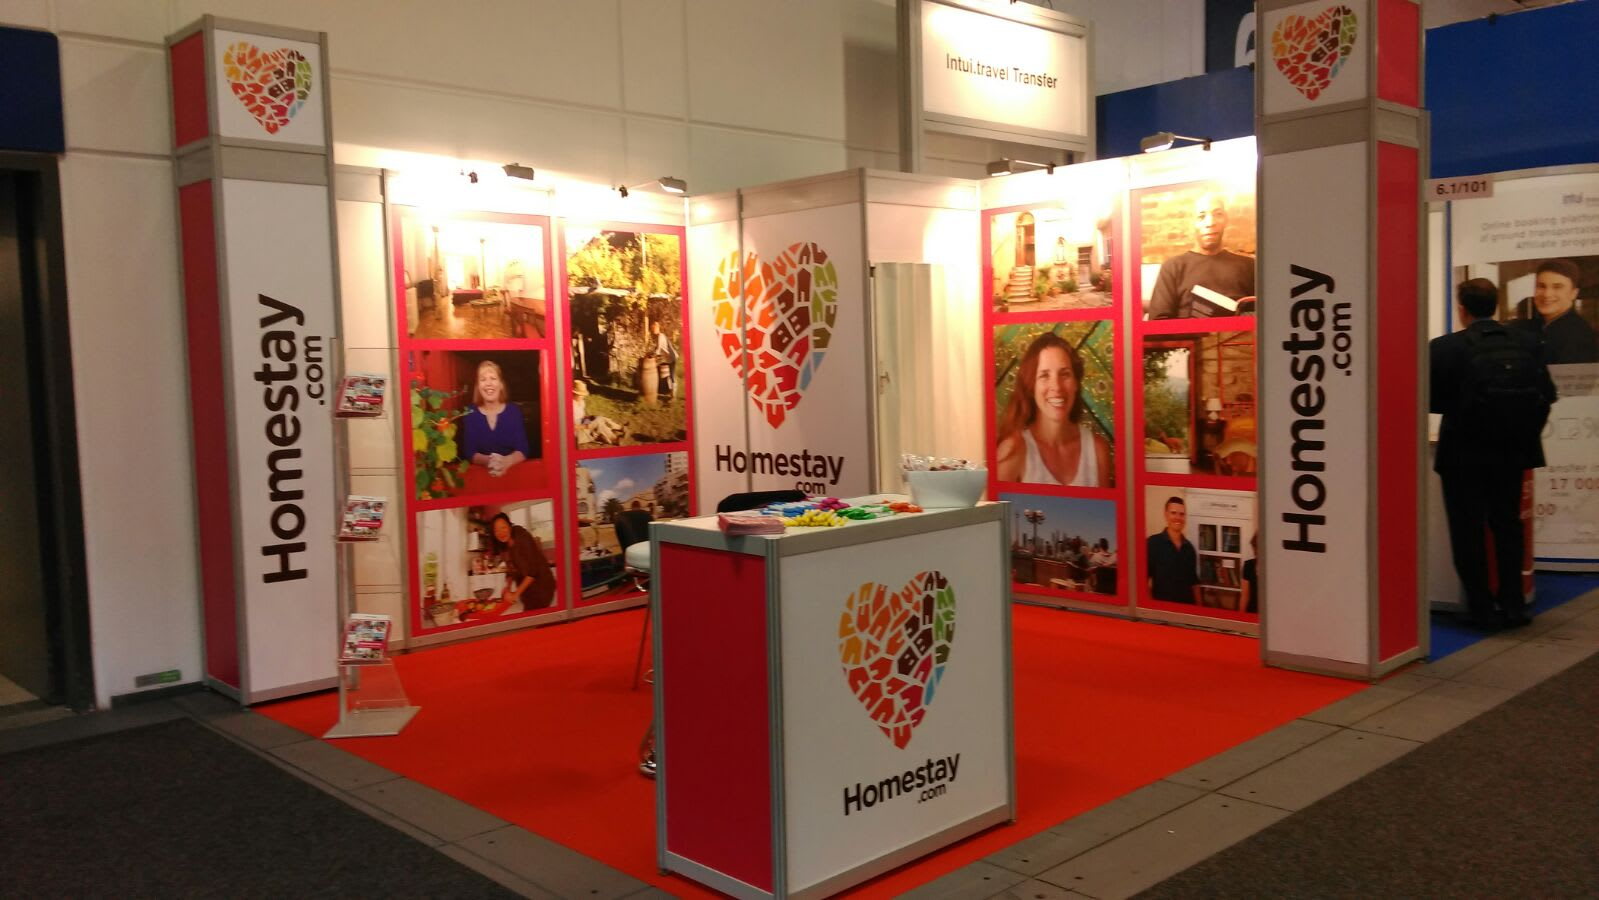 Homestay_ITB_Stall_Design_17ebef71-158a-4337-a50c-938ba812c6ad